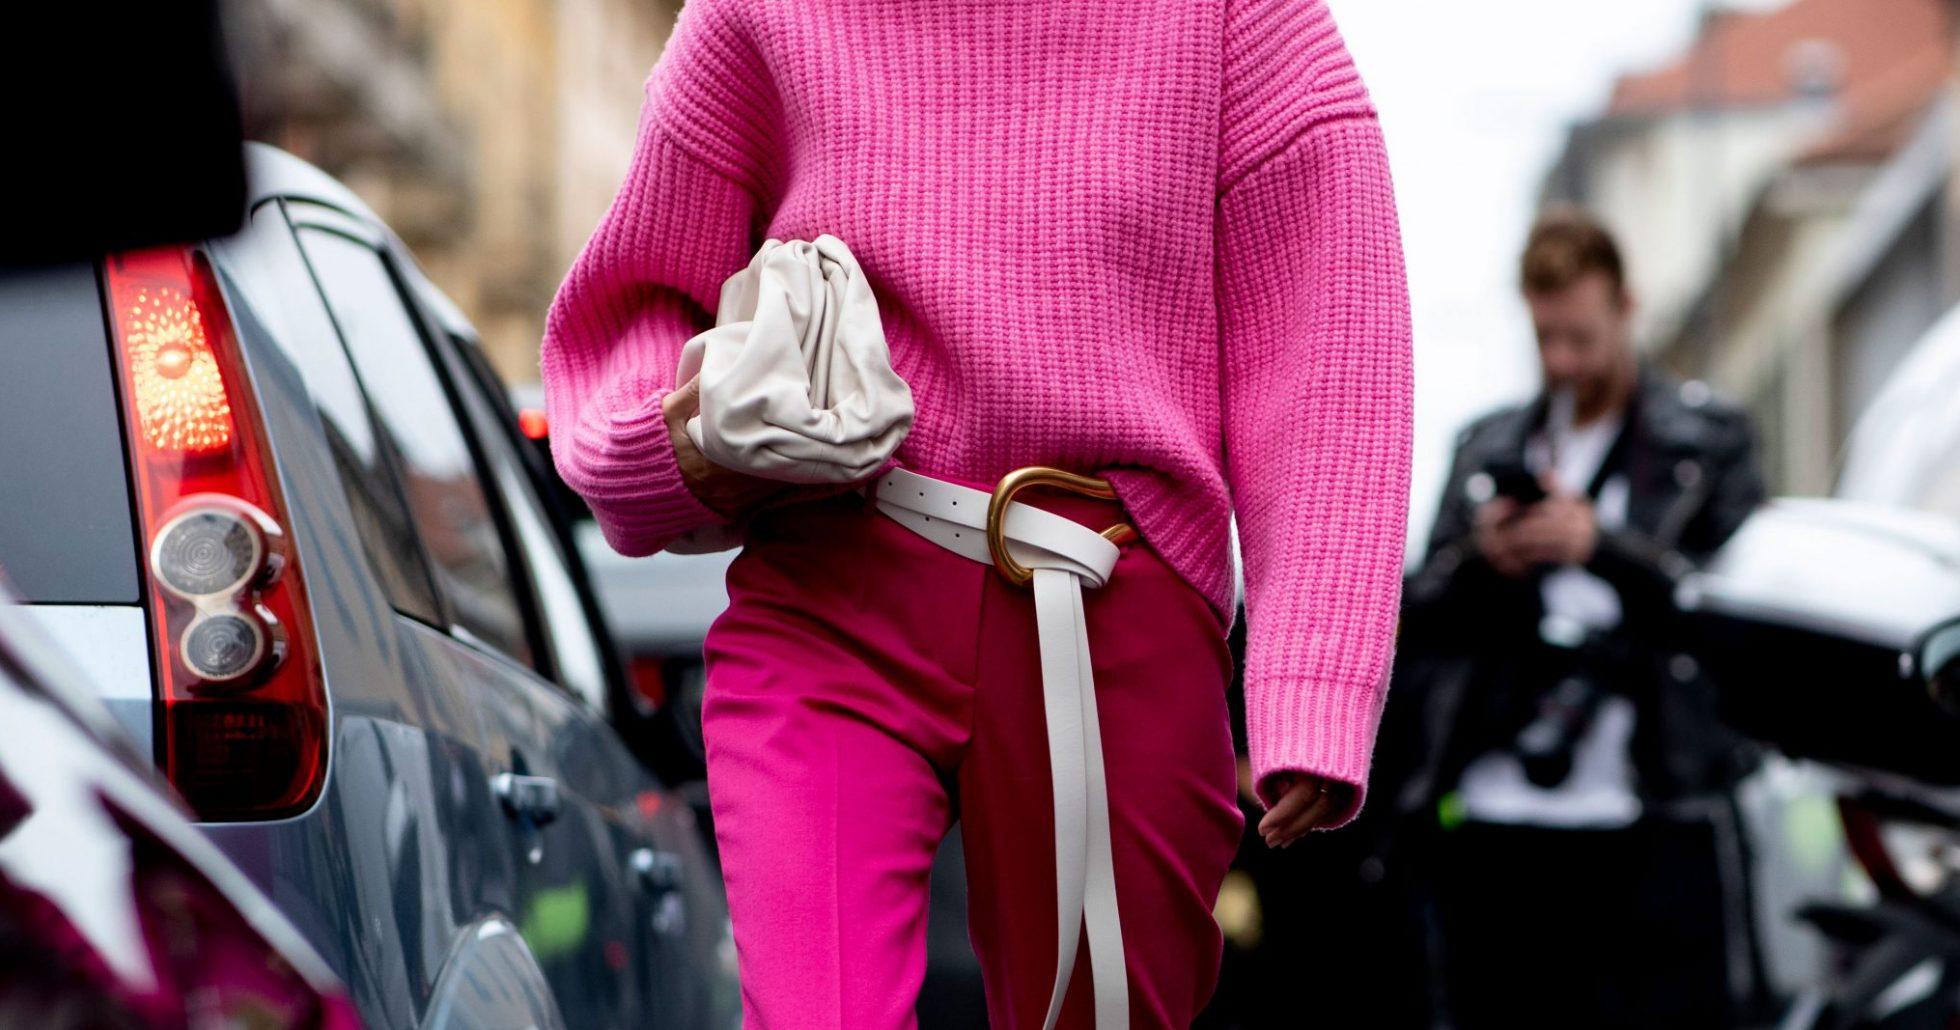 Rosa streetstyle-look från Milano Fashion Week ss20.